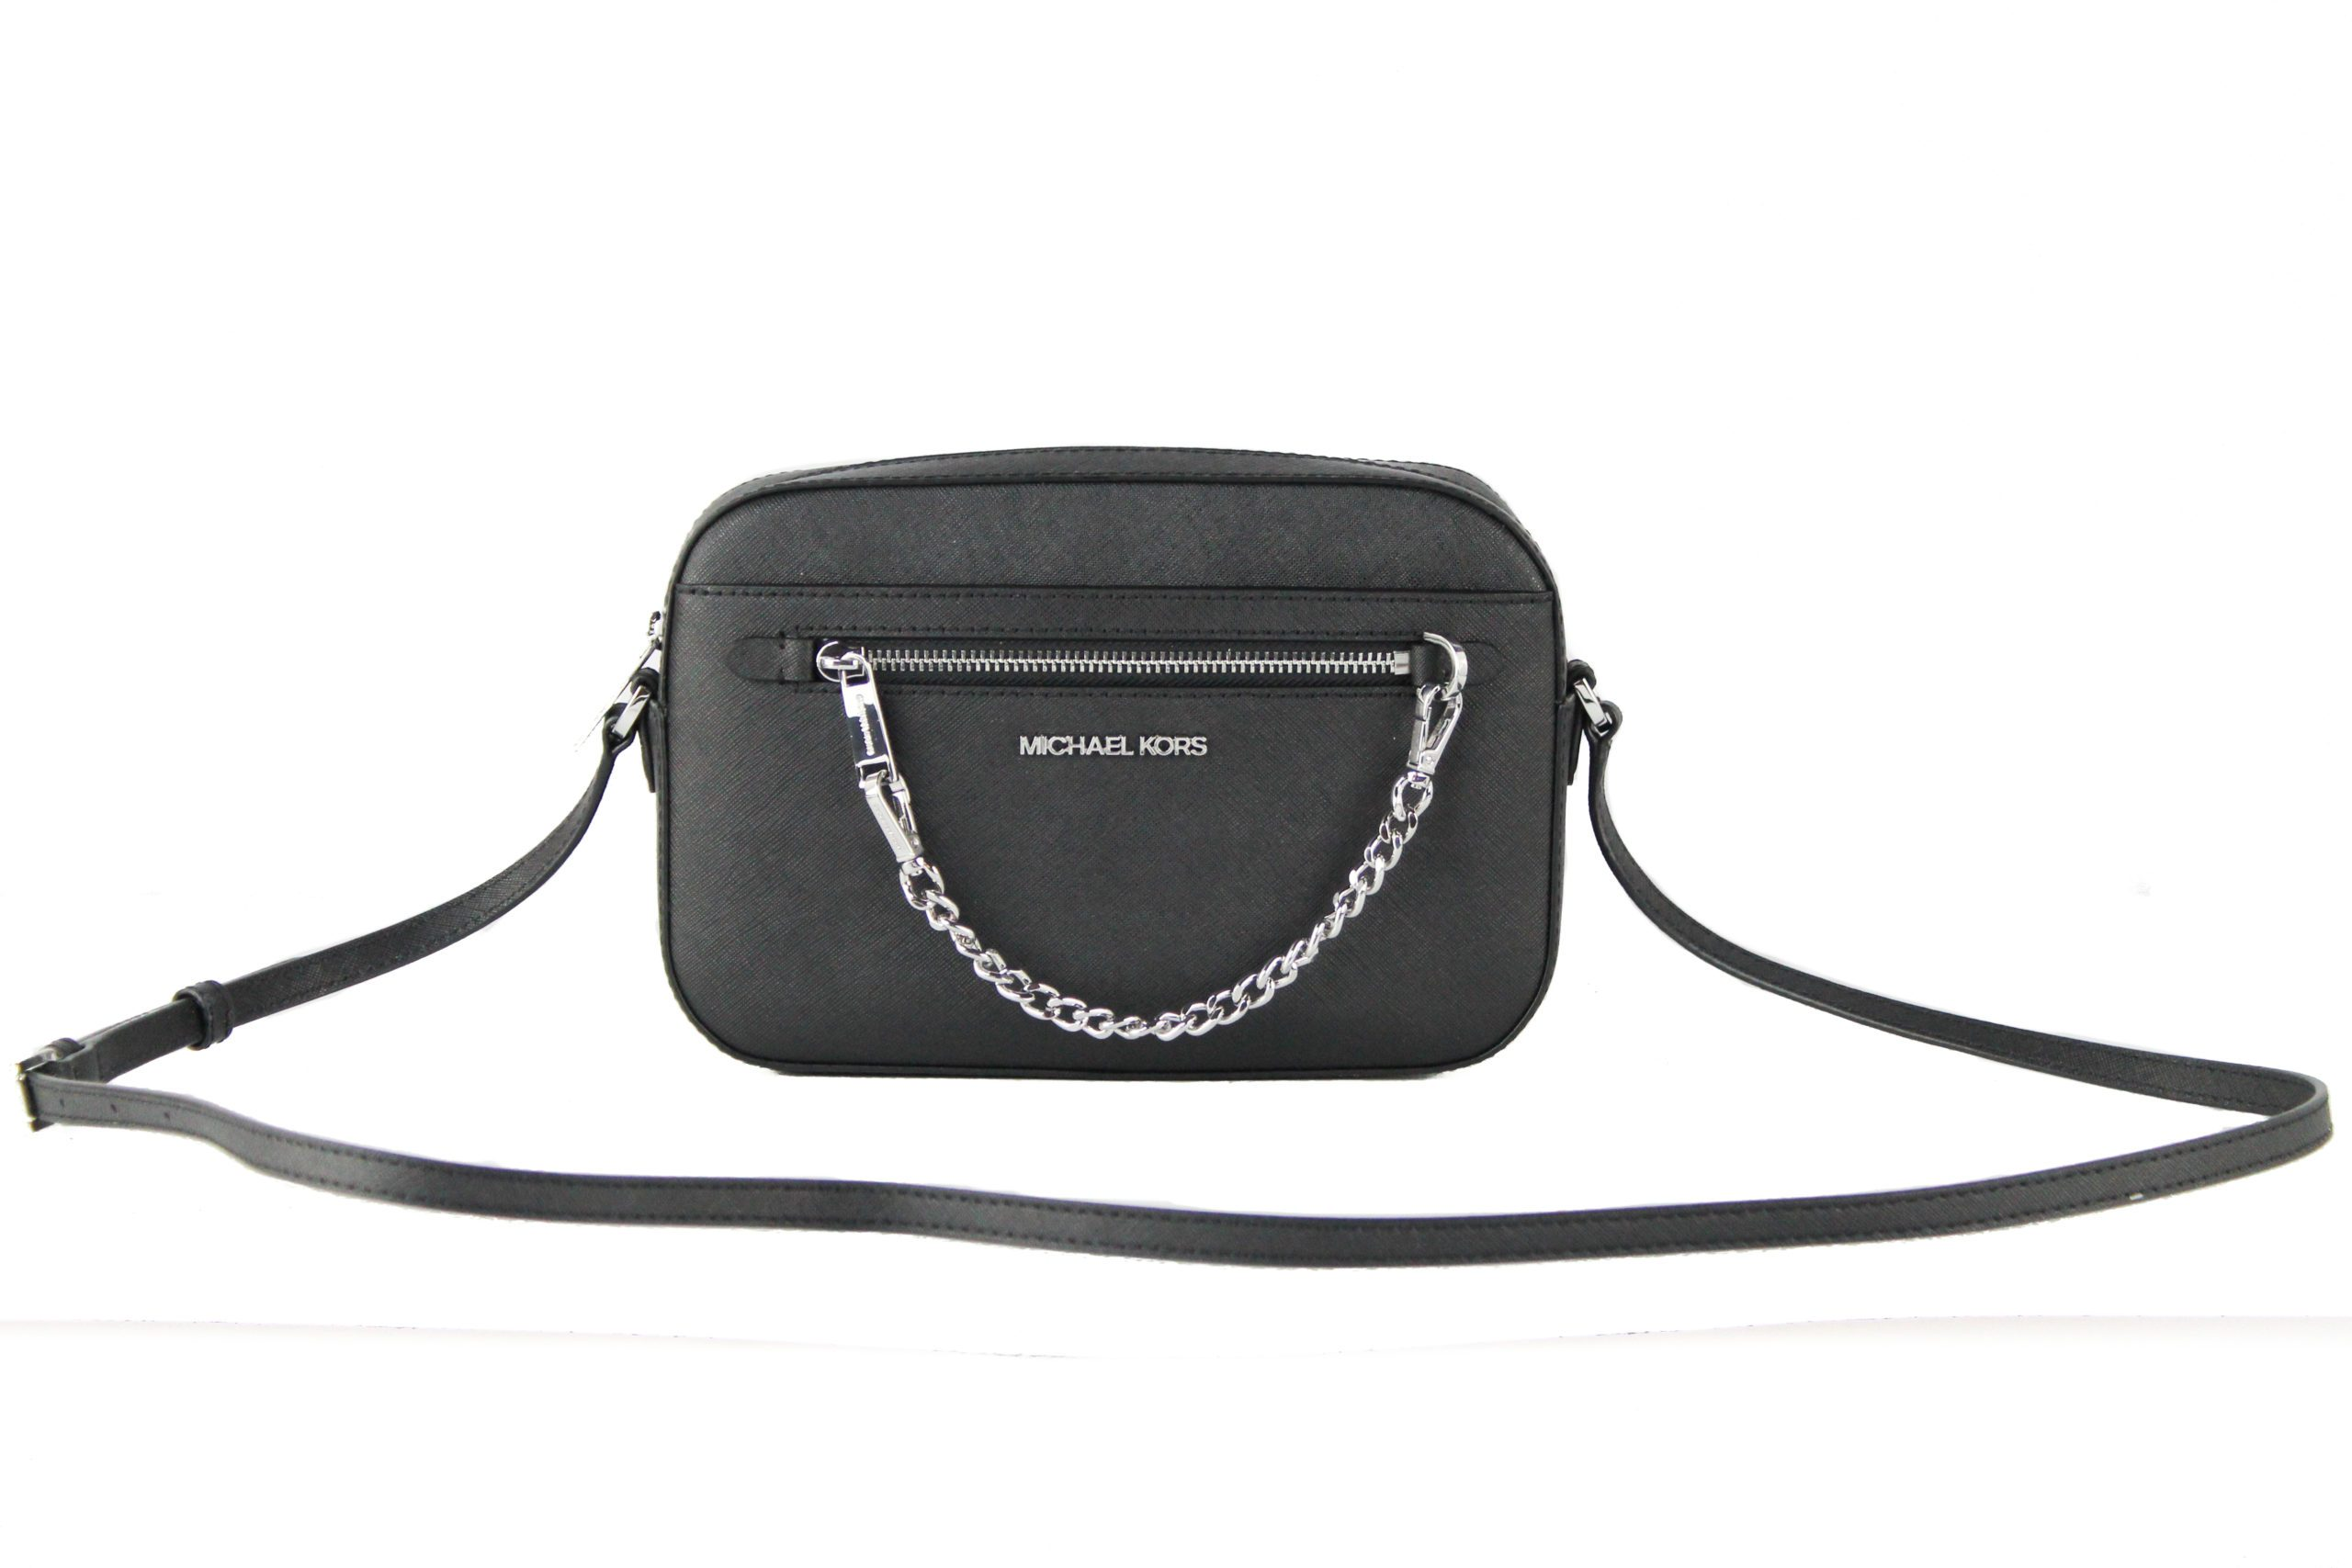 Michael Kors Women's Jet Set Crossbody Bag Black 13019